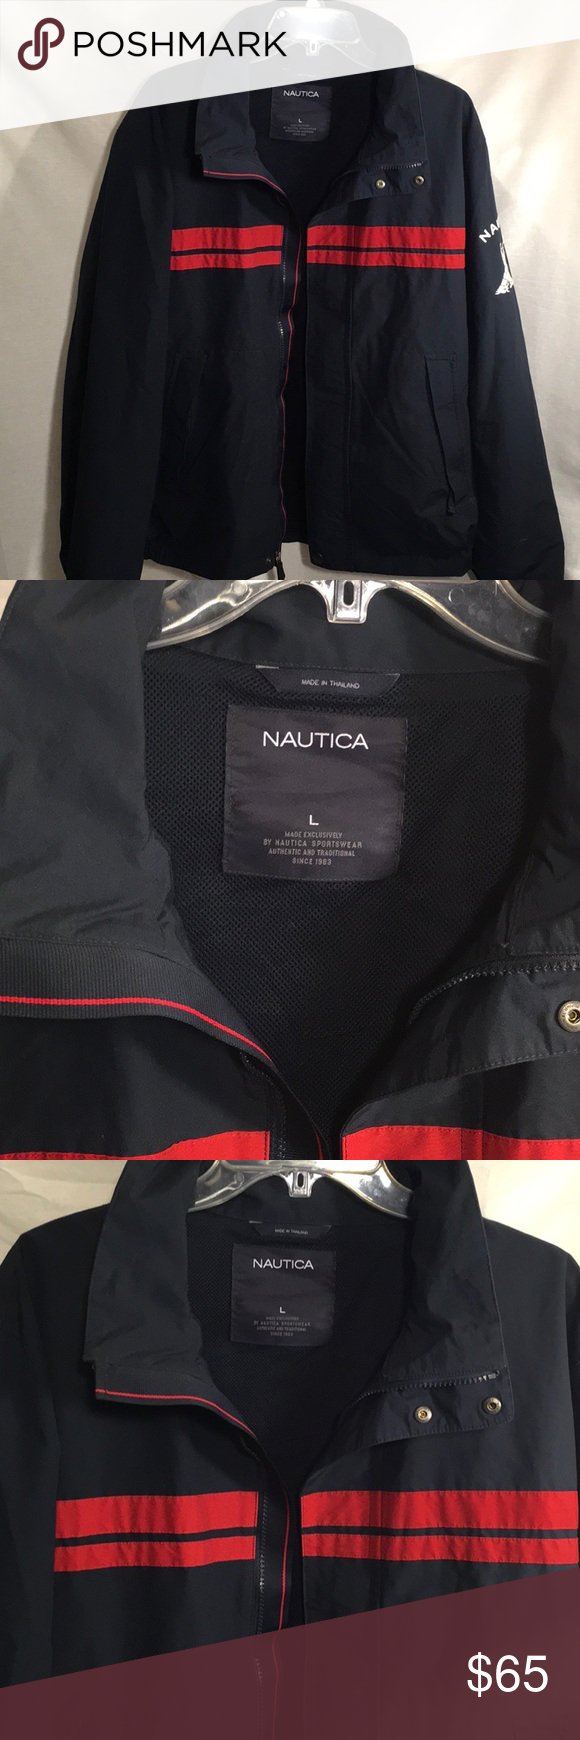 Unisex Nautica L Blue W Red Stripes Logo Jacket Trending Dark Blue Nautica Jacket Men S L Women S 2x Double Red Windbreaker Jackets Clothes Design [ 1740 x 580 Pixel ]